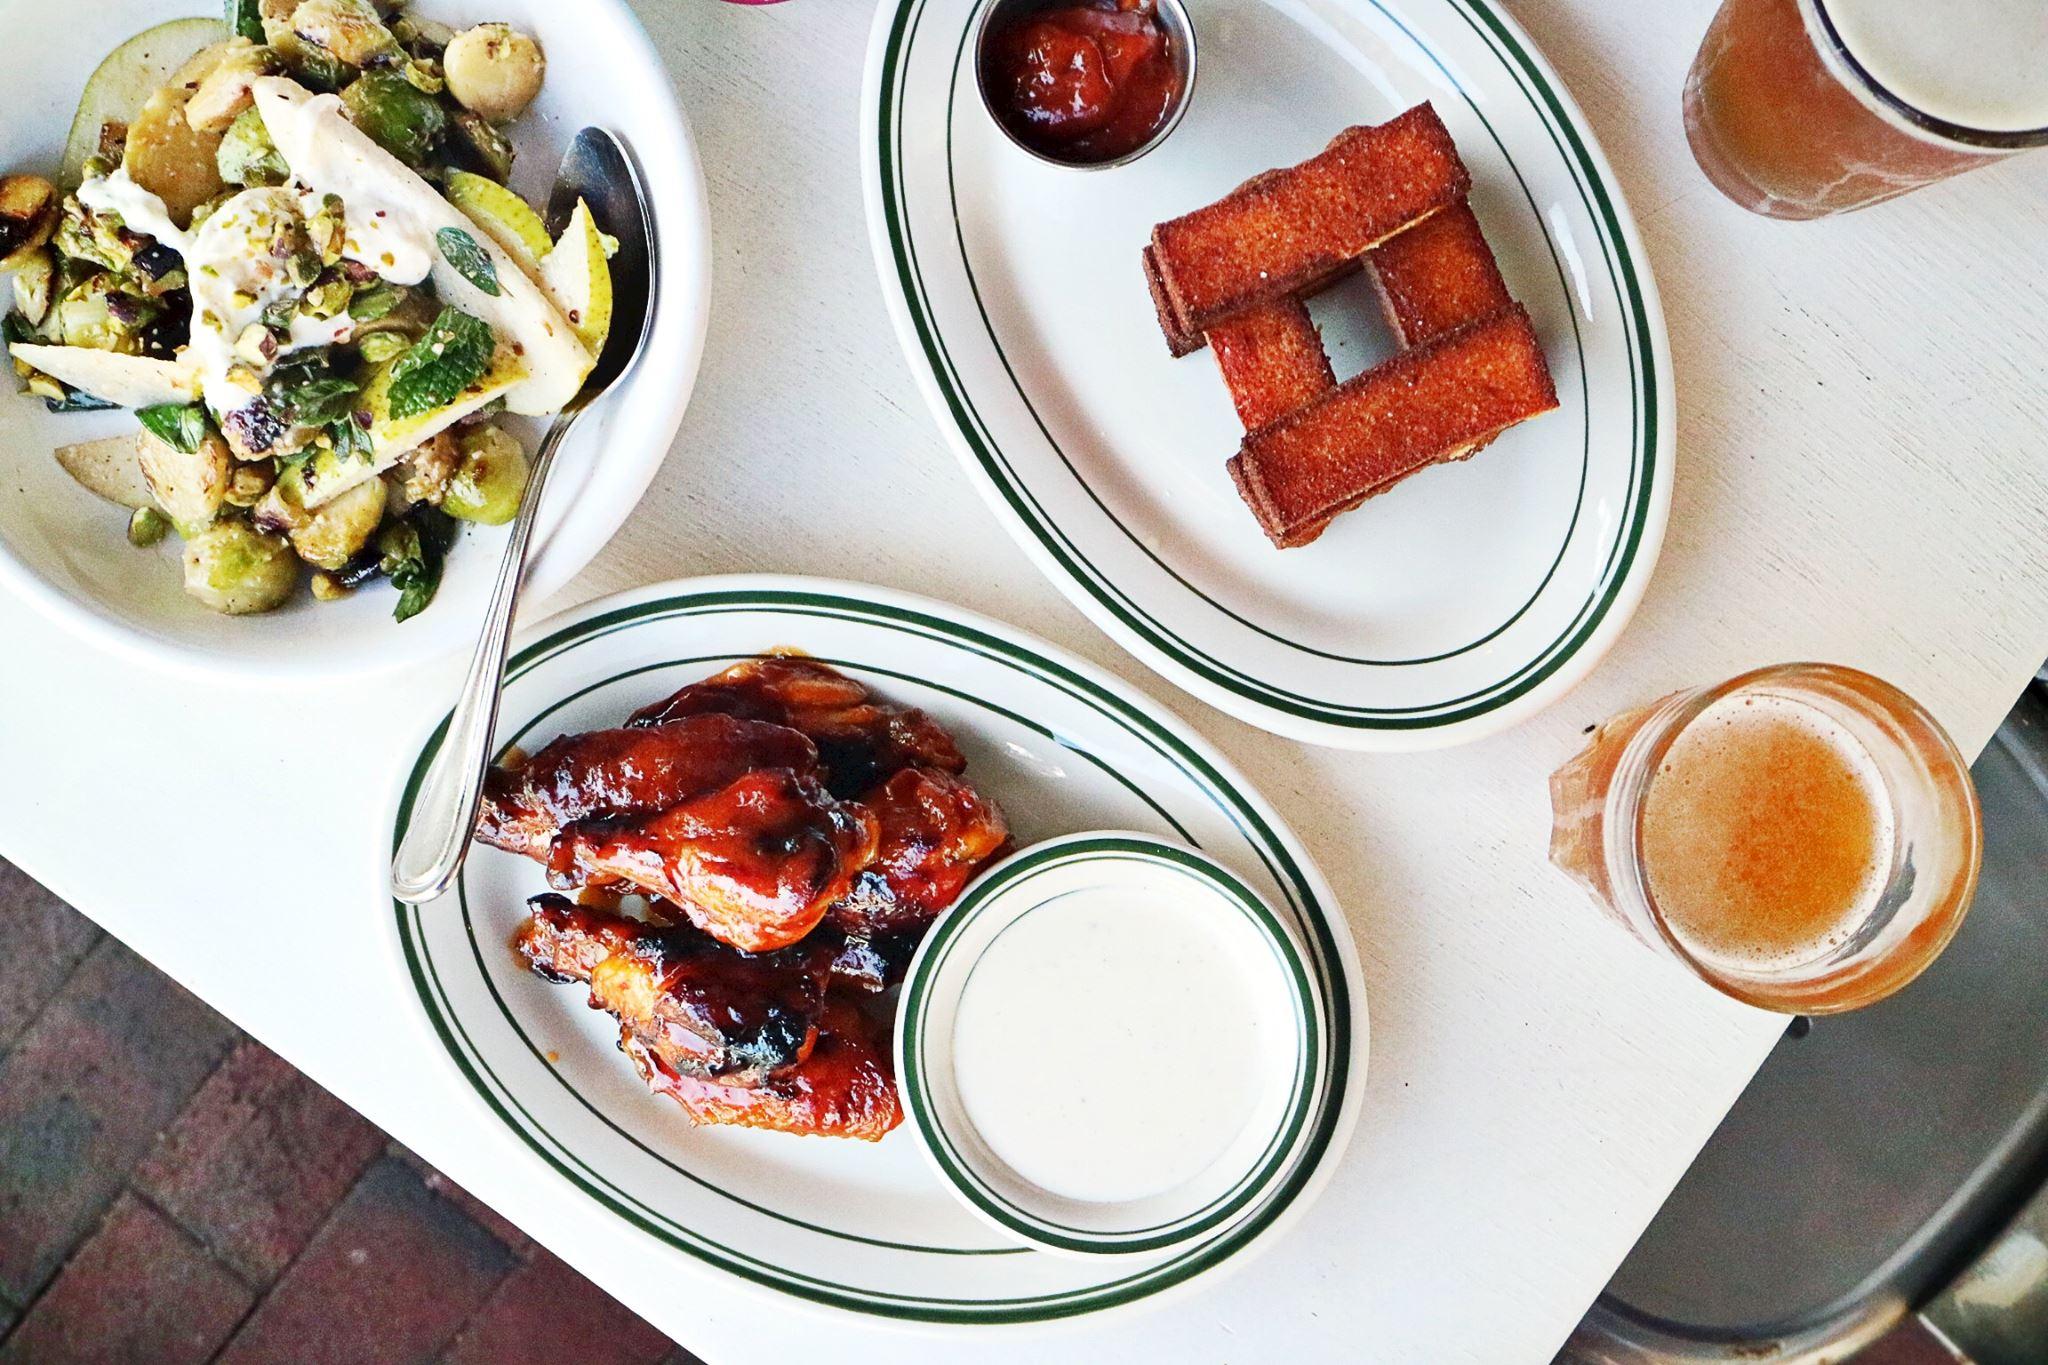 HARRY'S PIZZERIA-RESTAURANT & DINING